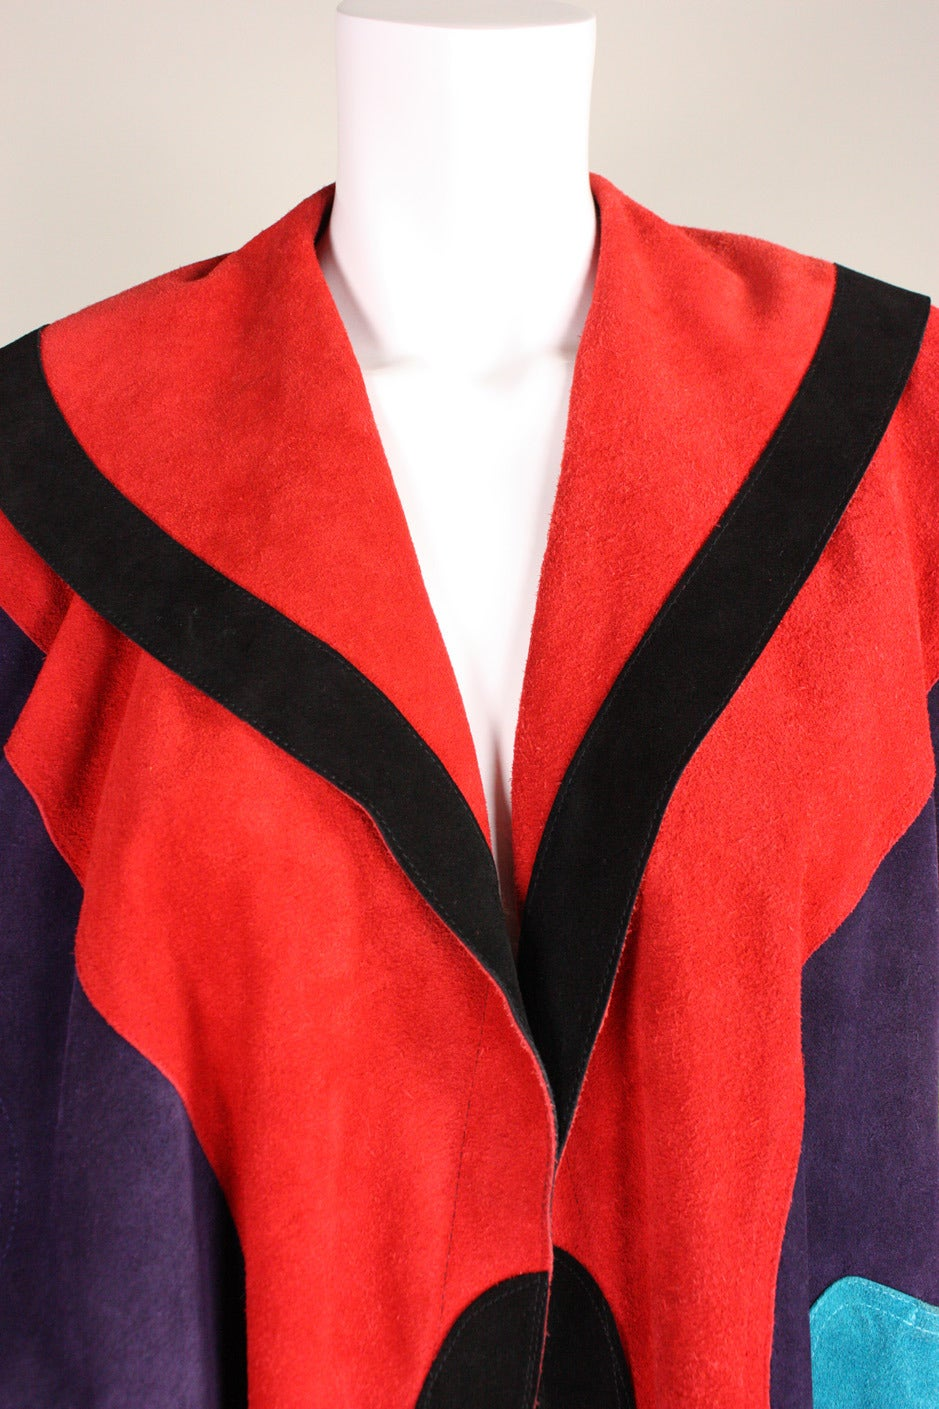 Jean Muir Colorblocked Suede Coat 6